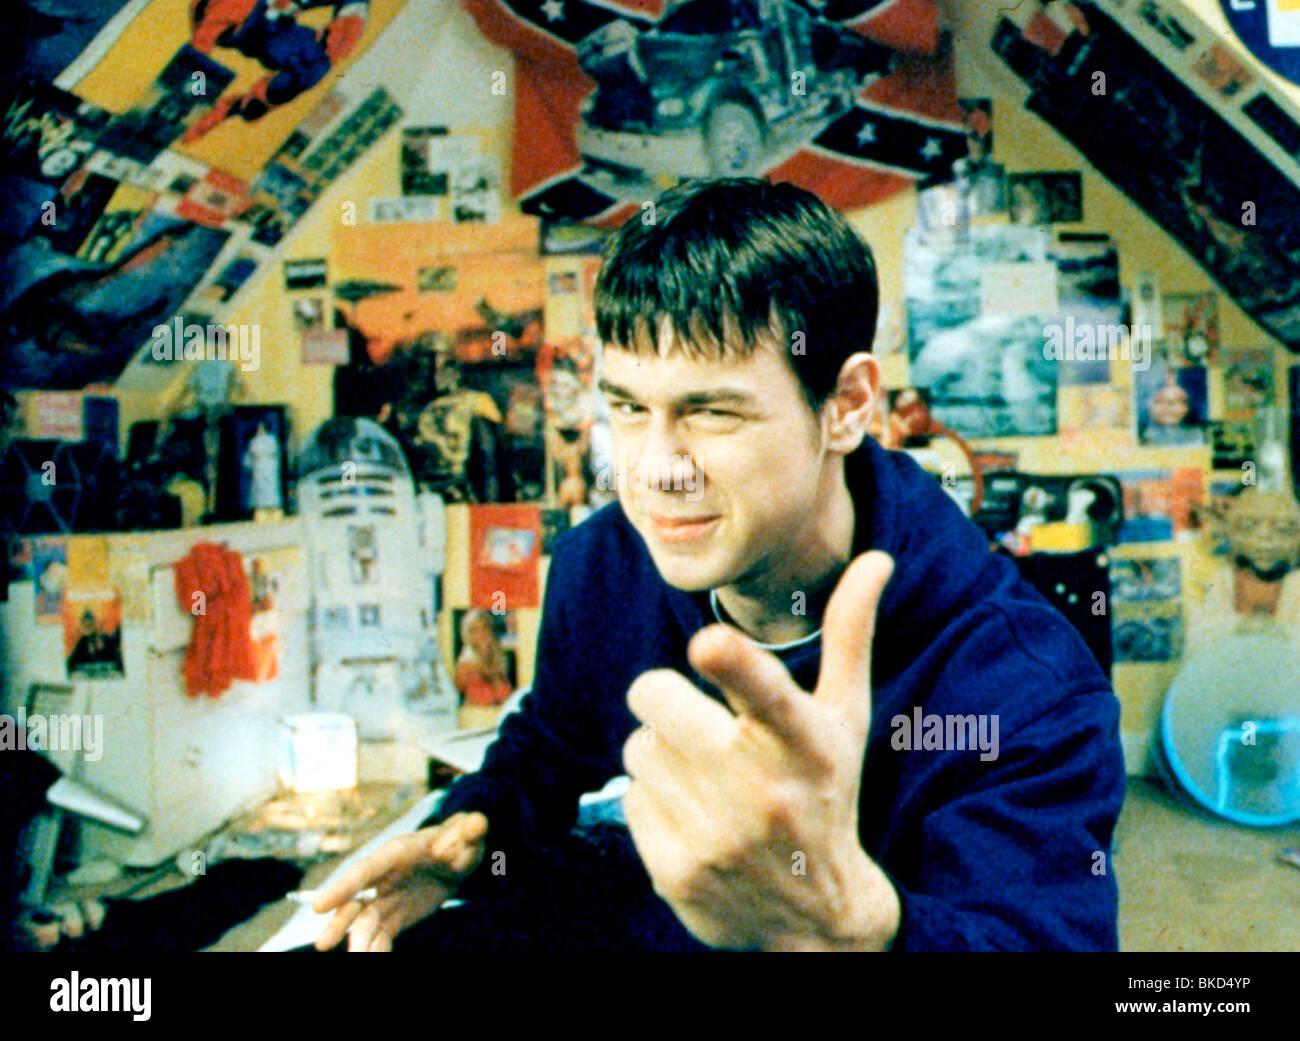 HUMAN TRAFFIC -1999 DANNY DYER - Stock Image